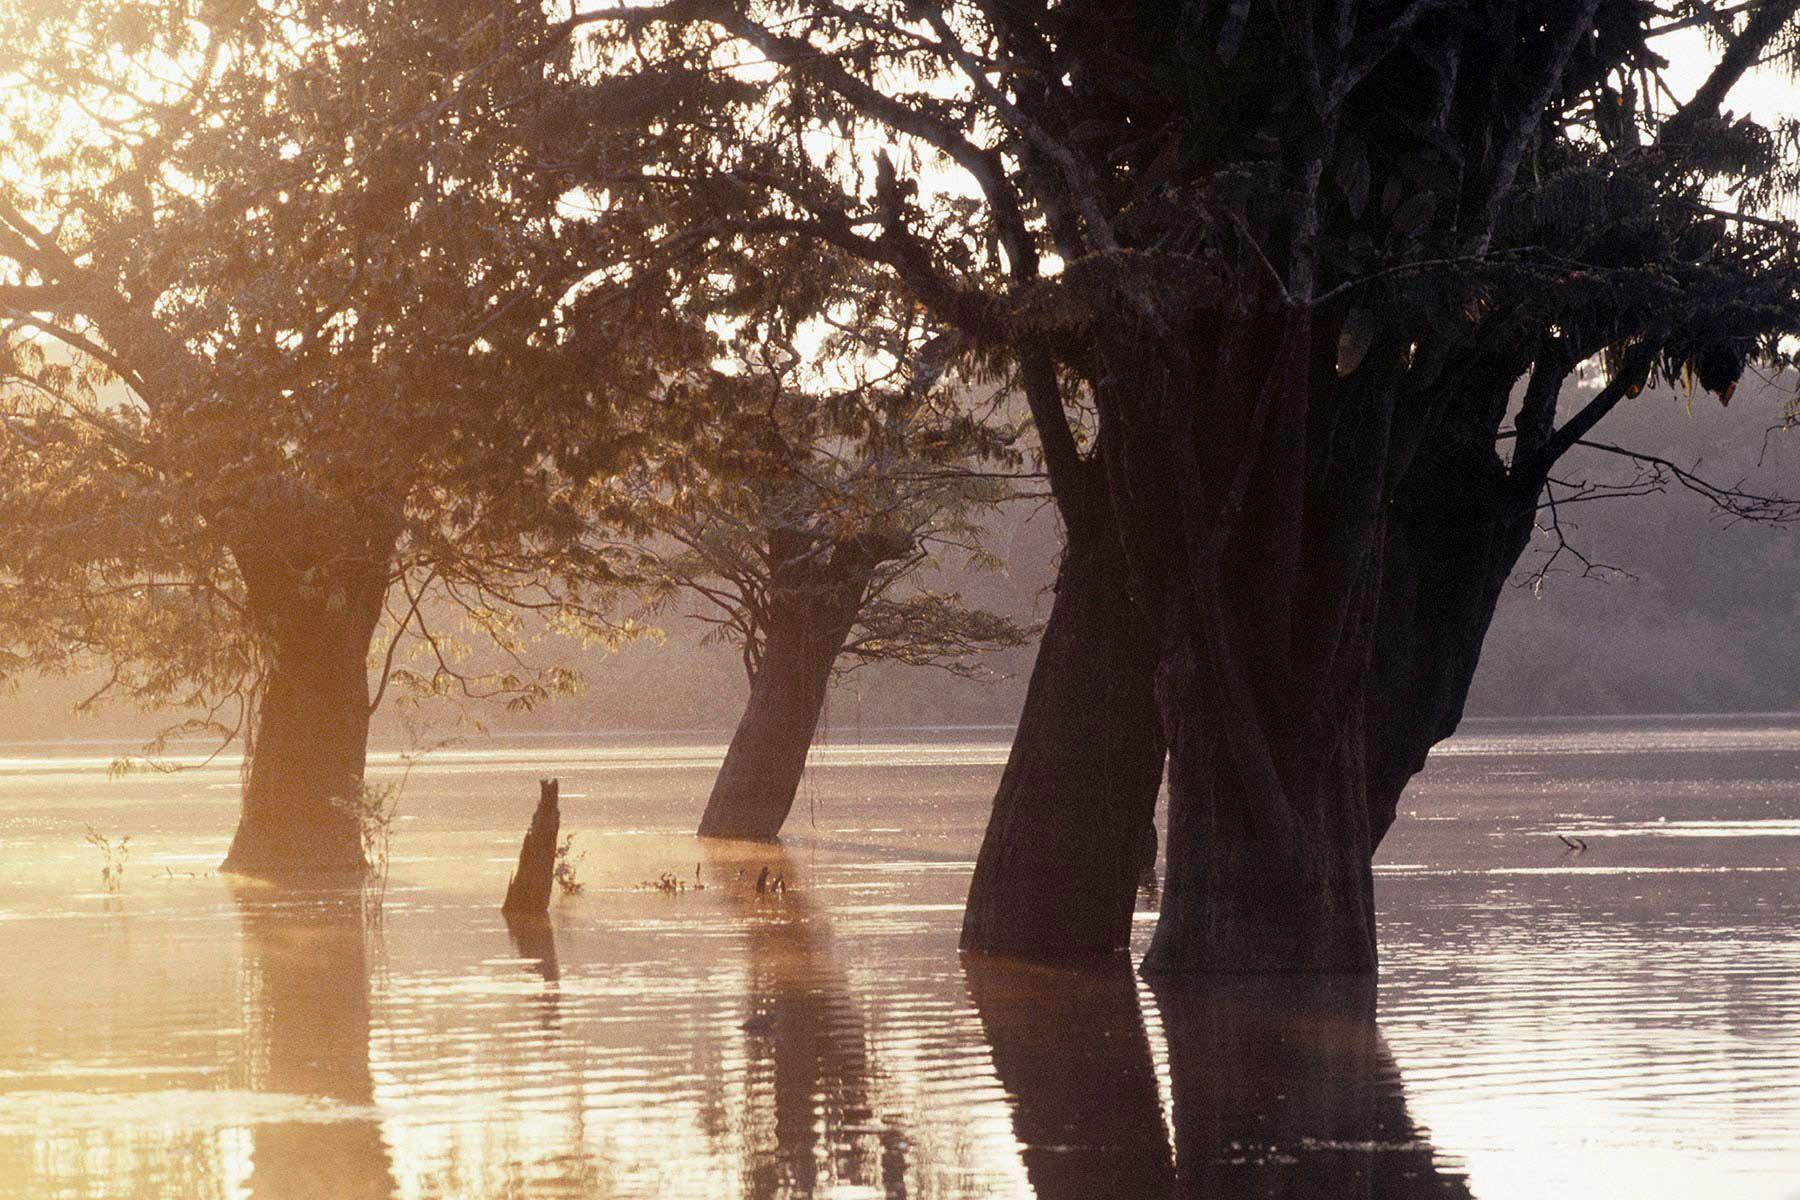 Cuyabeno Wildlife Reserve, Amazon basin, Ecuador